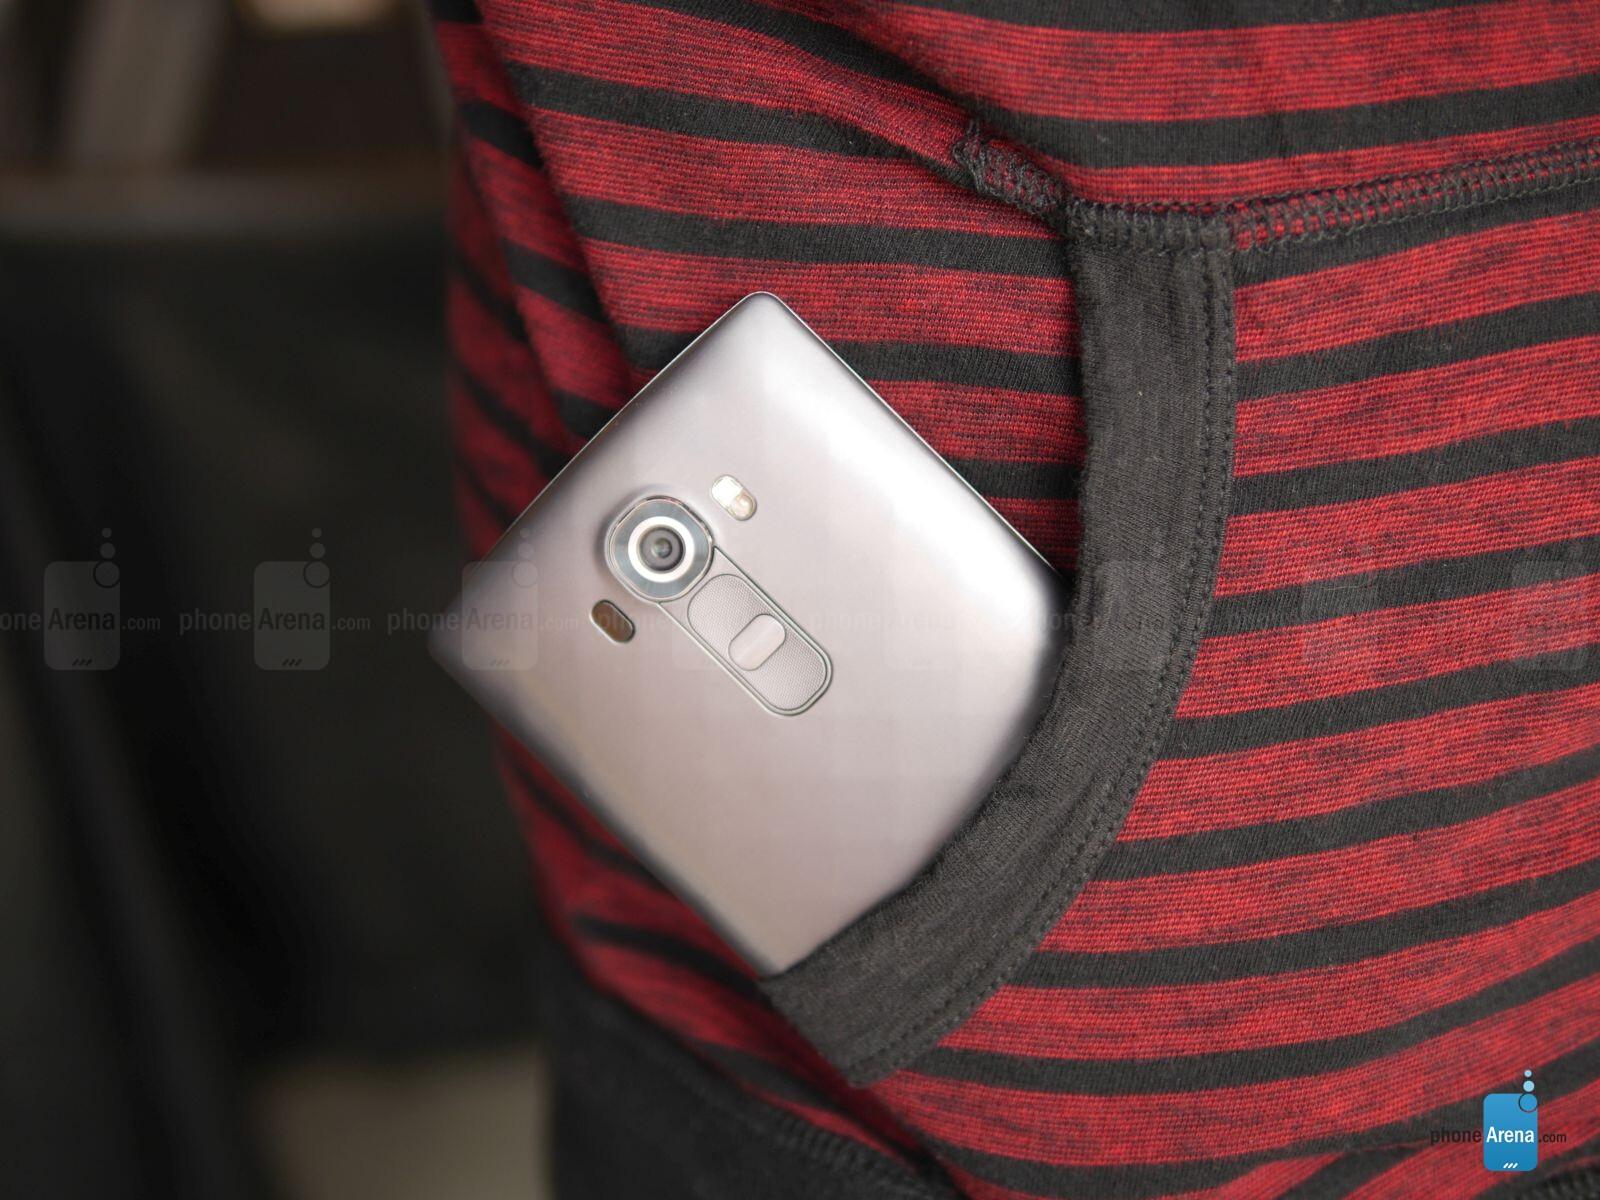 LG G4 color spectrum sensor explained: helps you nail